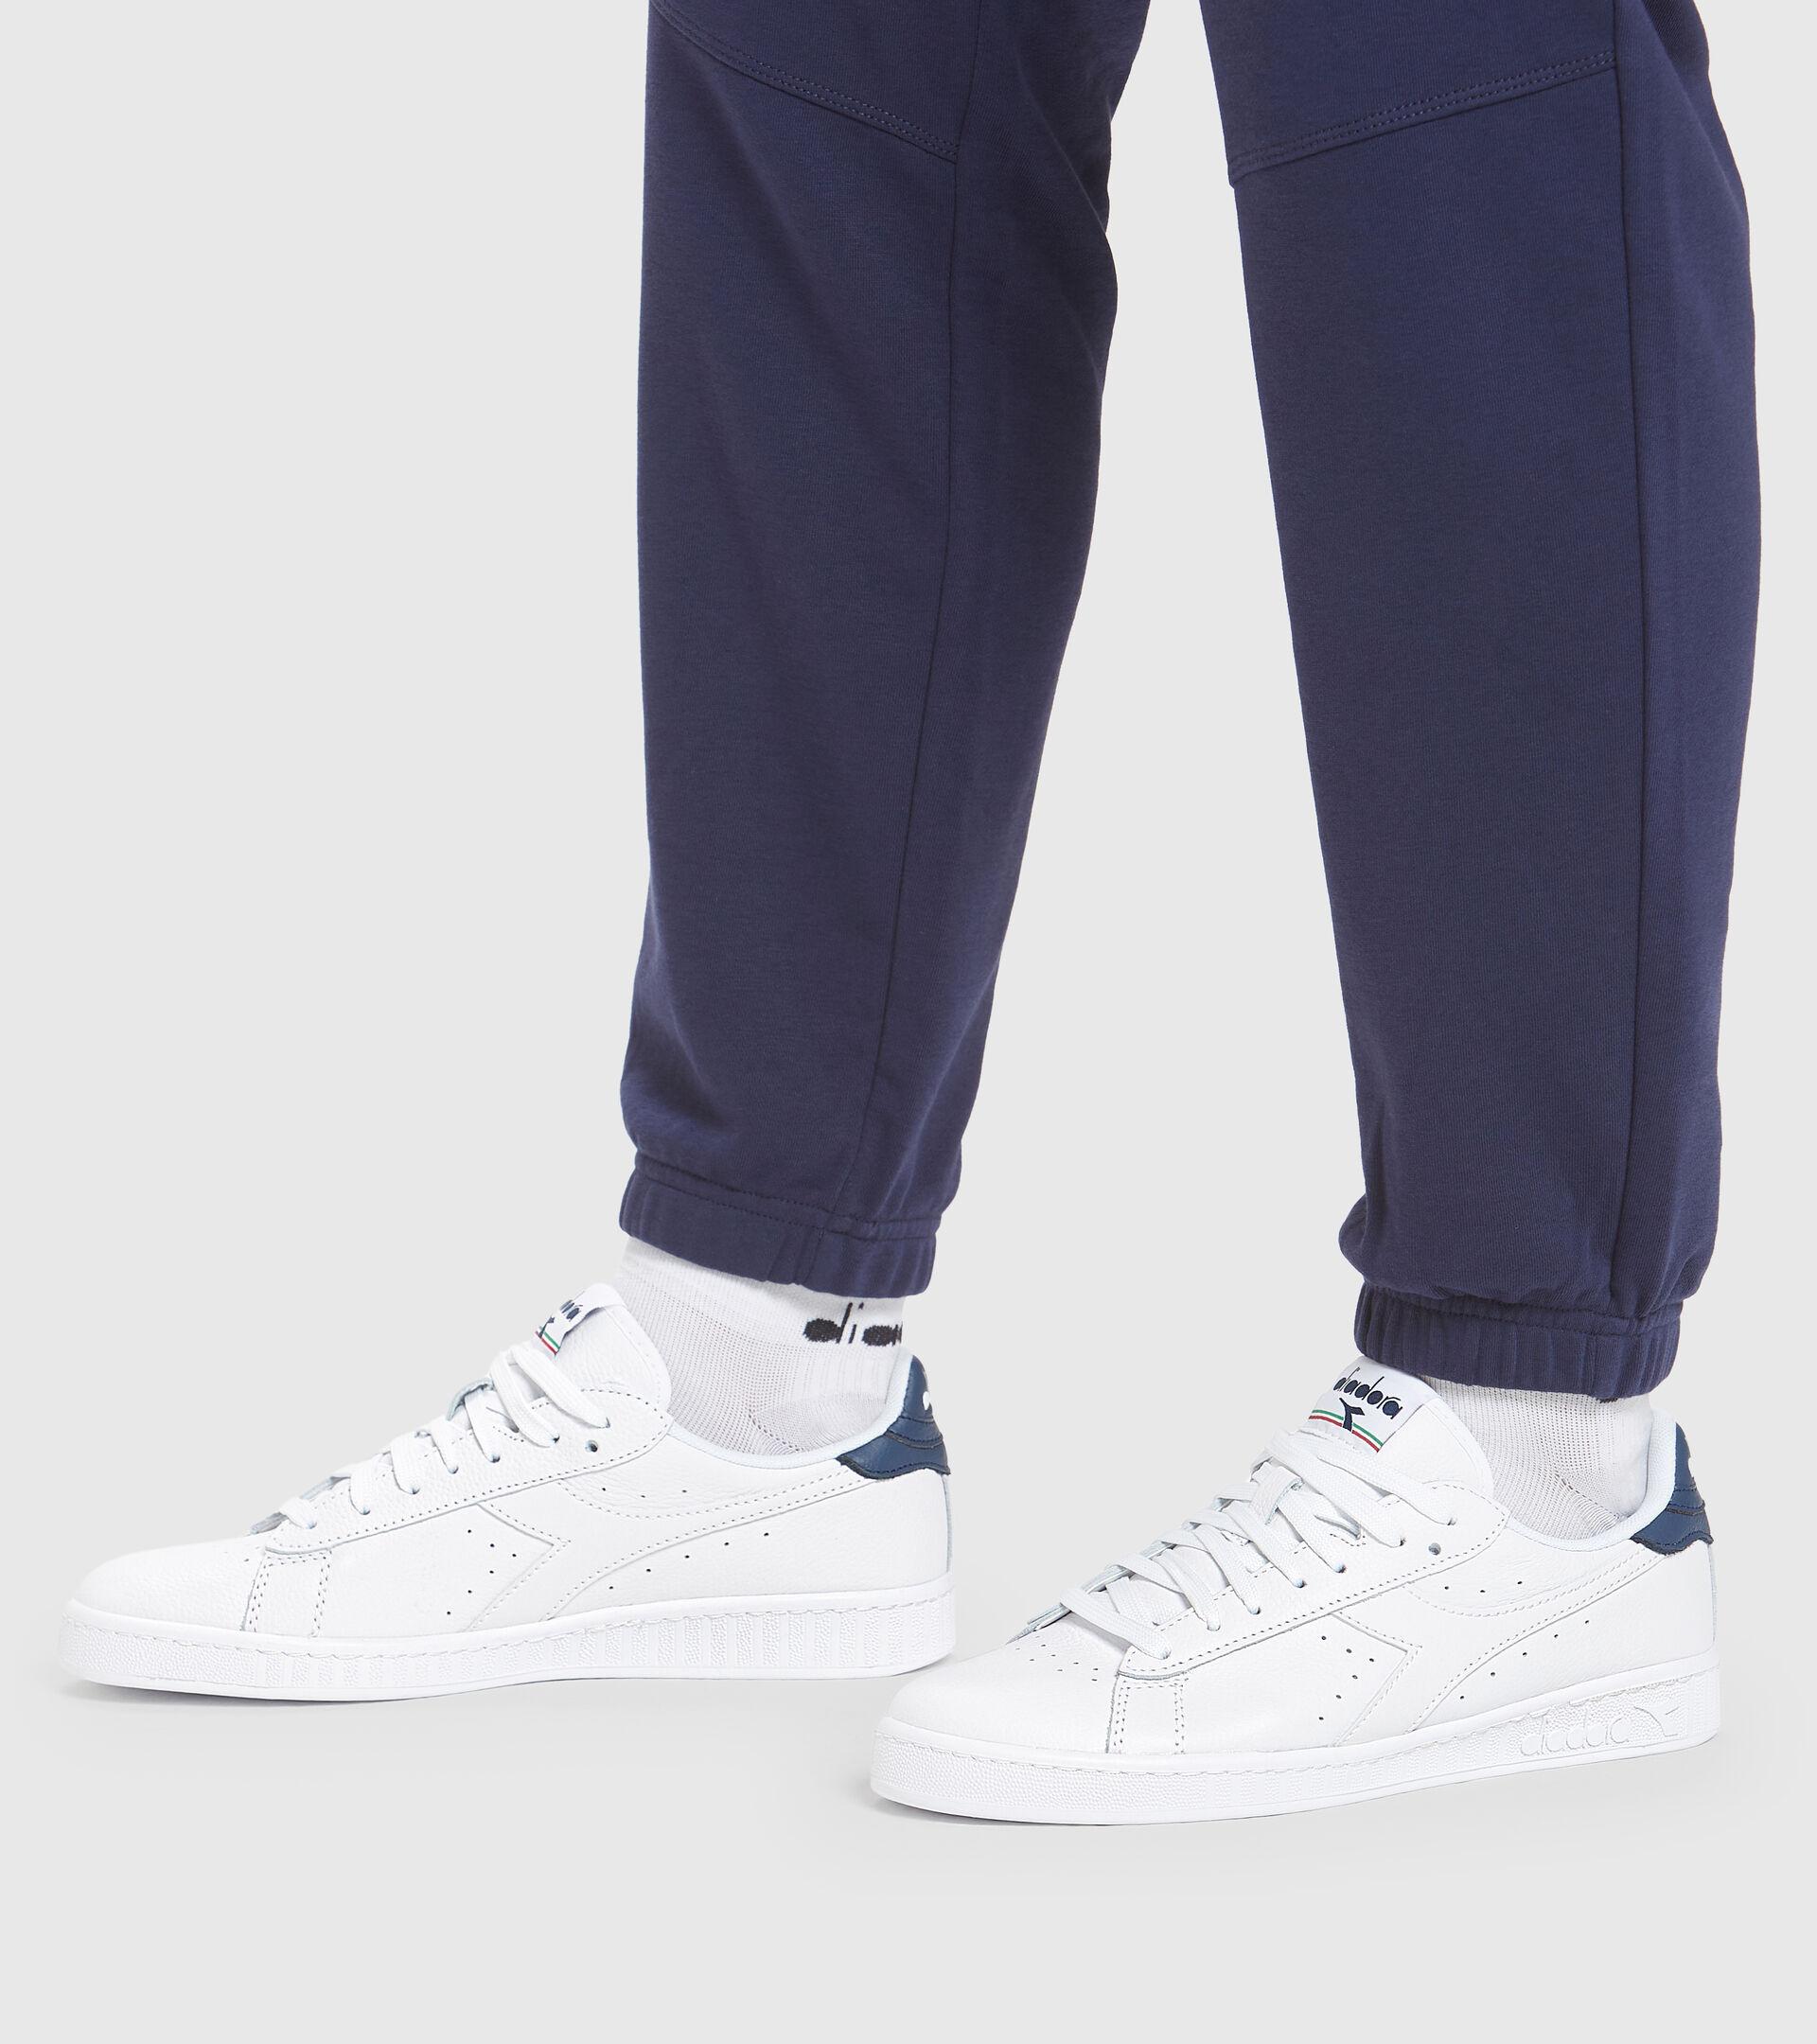 Footwear Sportswear UNISEX GAME L LOW OPTICAL WHITE/BLUE DARK DENIM Diadora